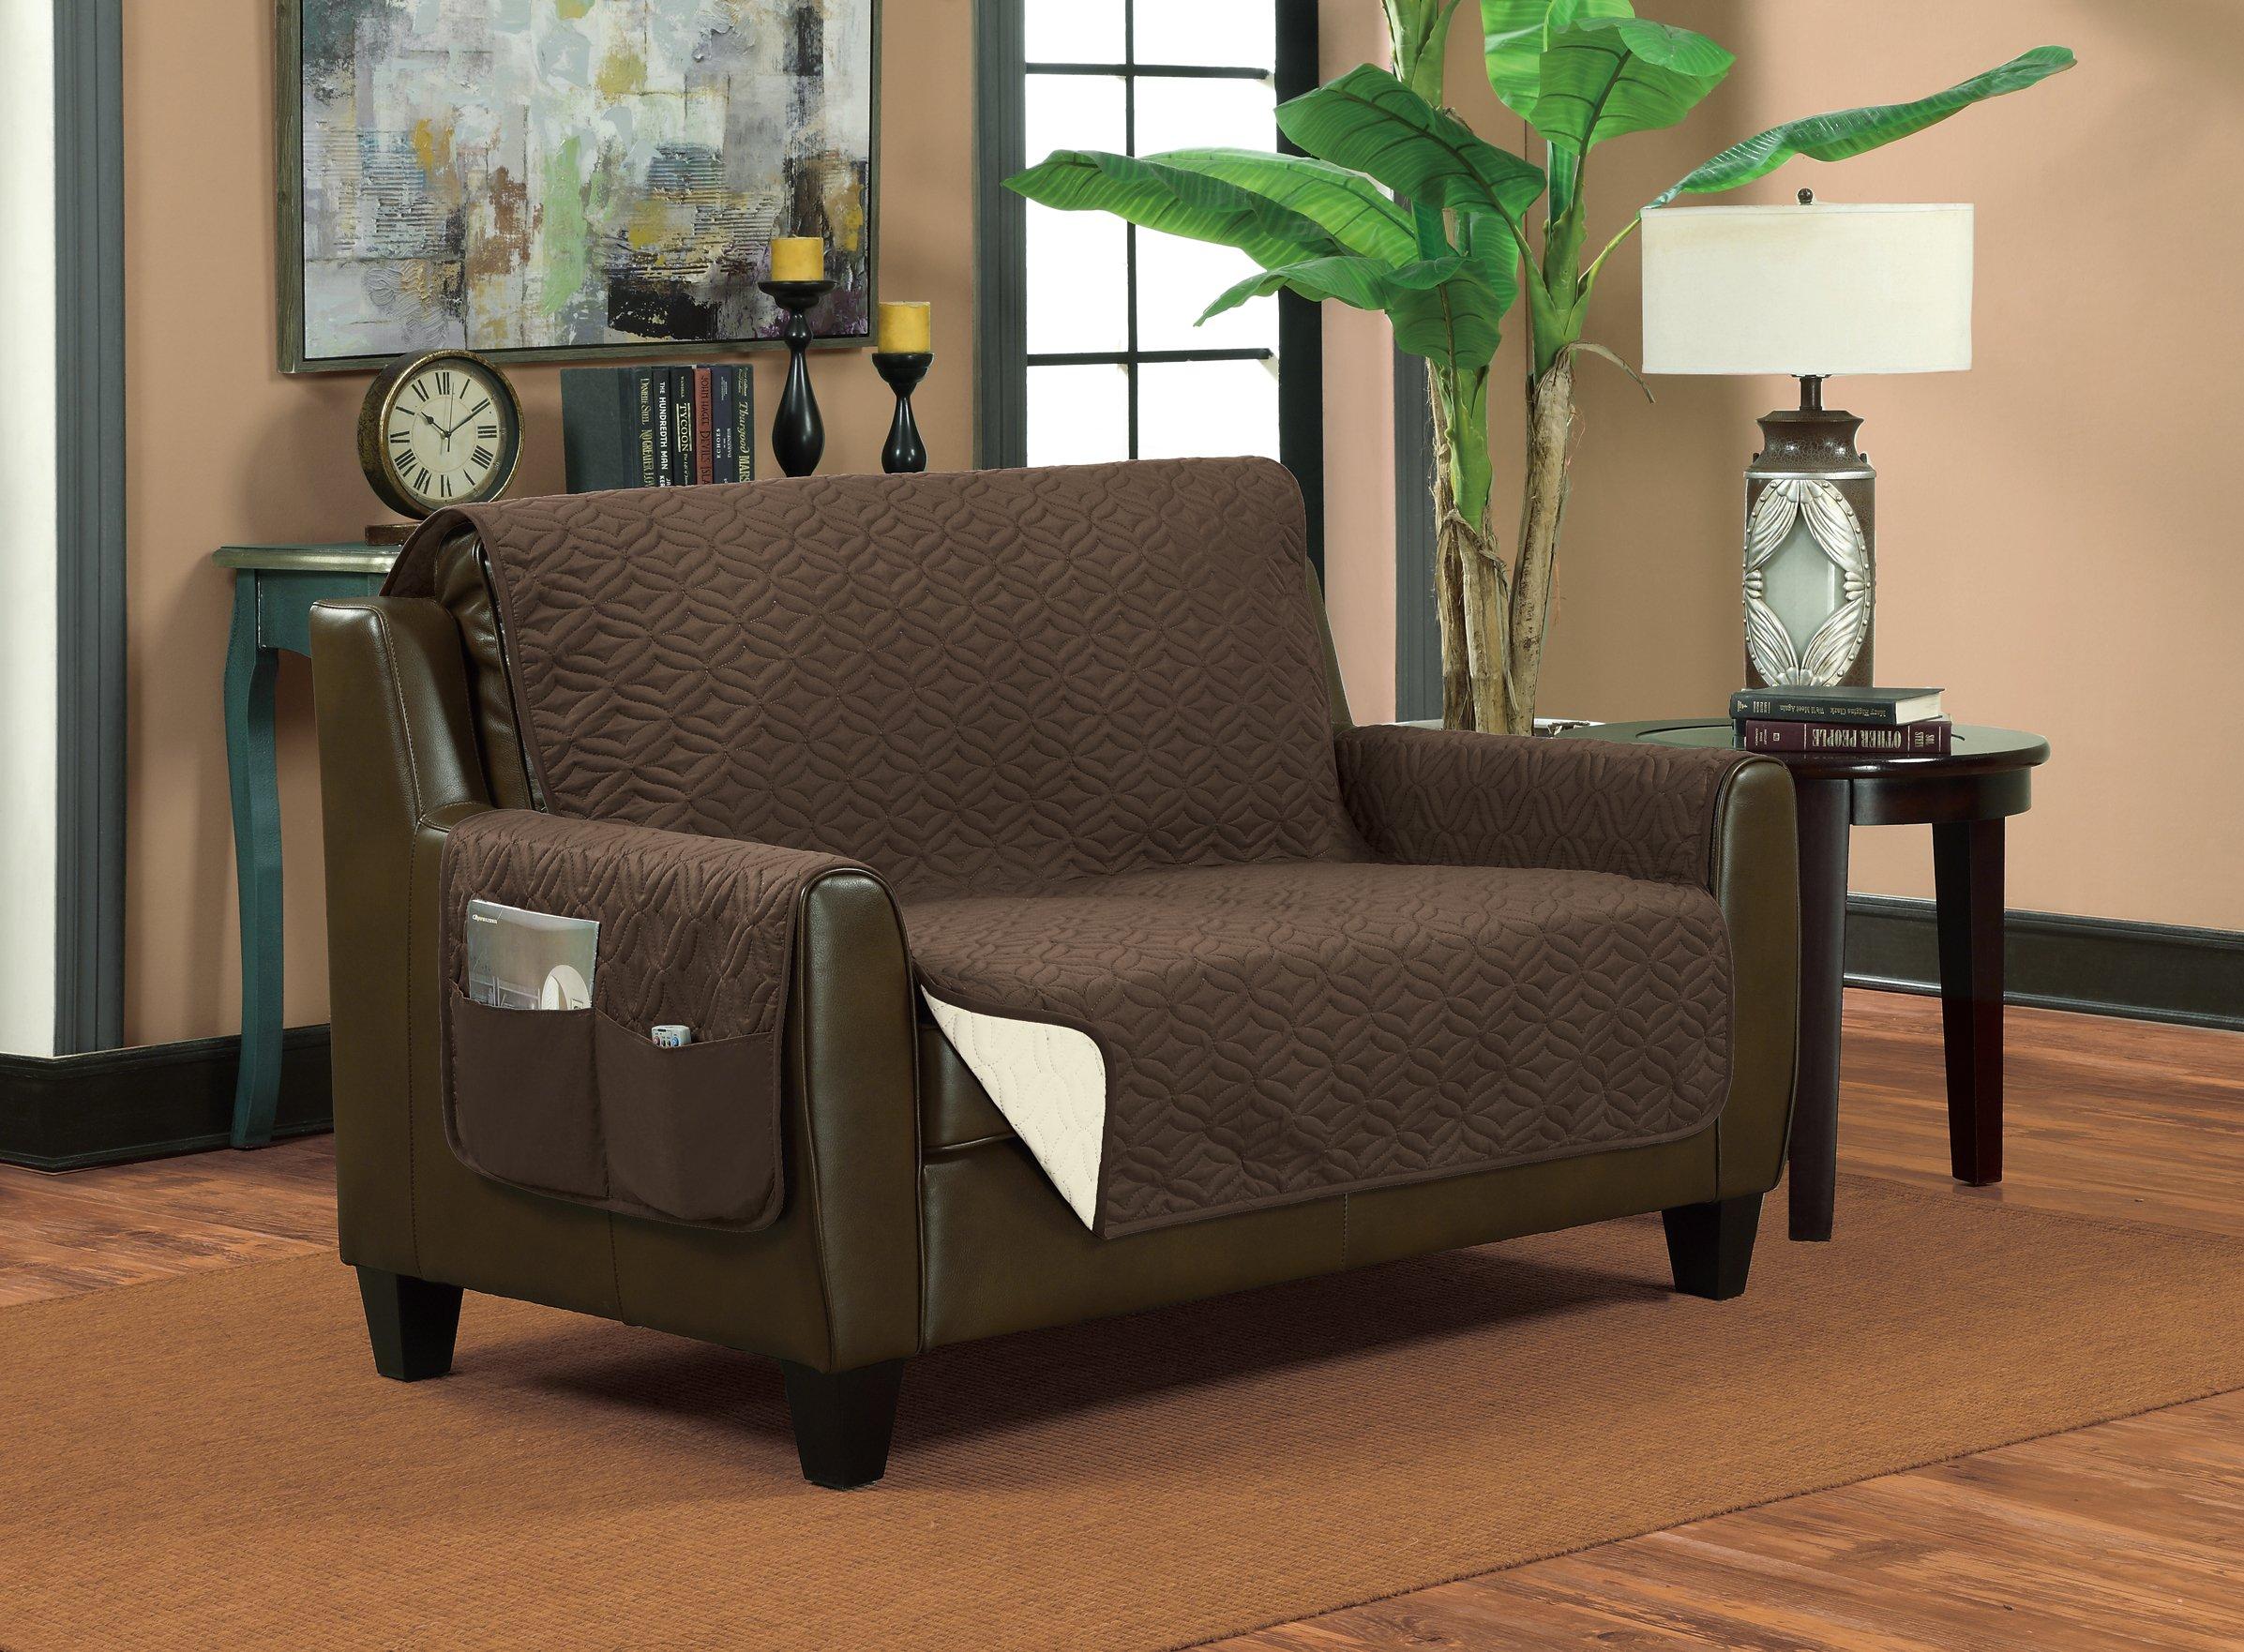 Bella Kline Reversible SOFA Furniture Protector, With 2 Storage Pockets - Mocha / Tan by BELLA KLINE DESIGN (Image #5)